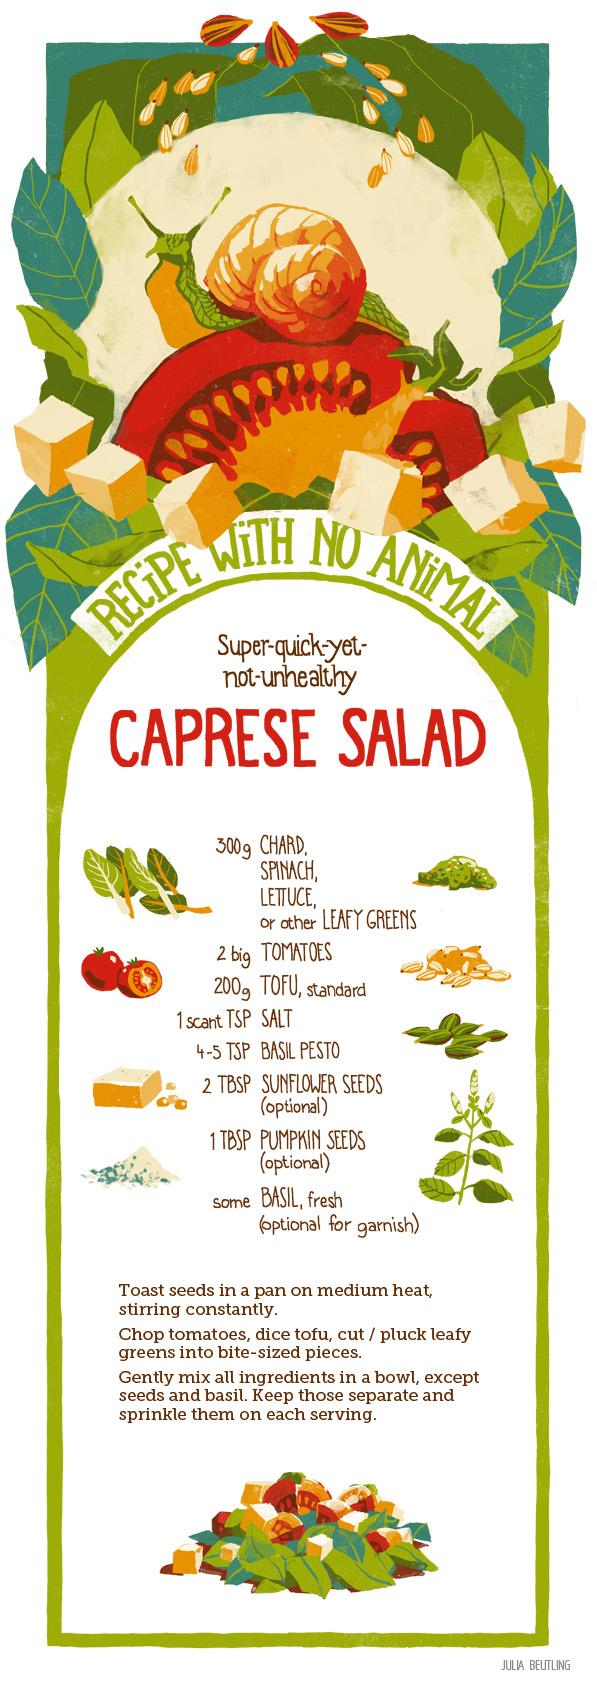 WEB rezept 6 EN caprese salad julia beutling